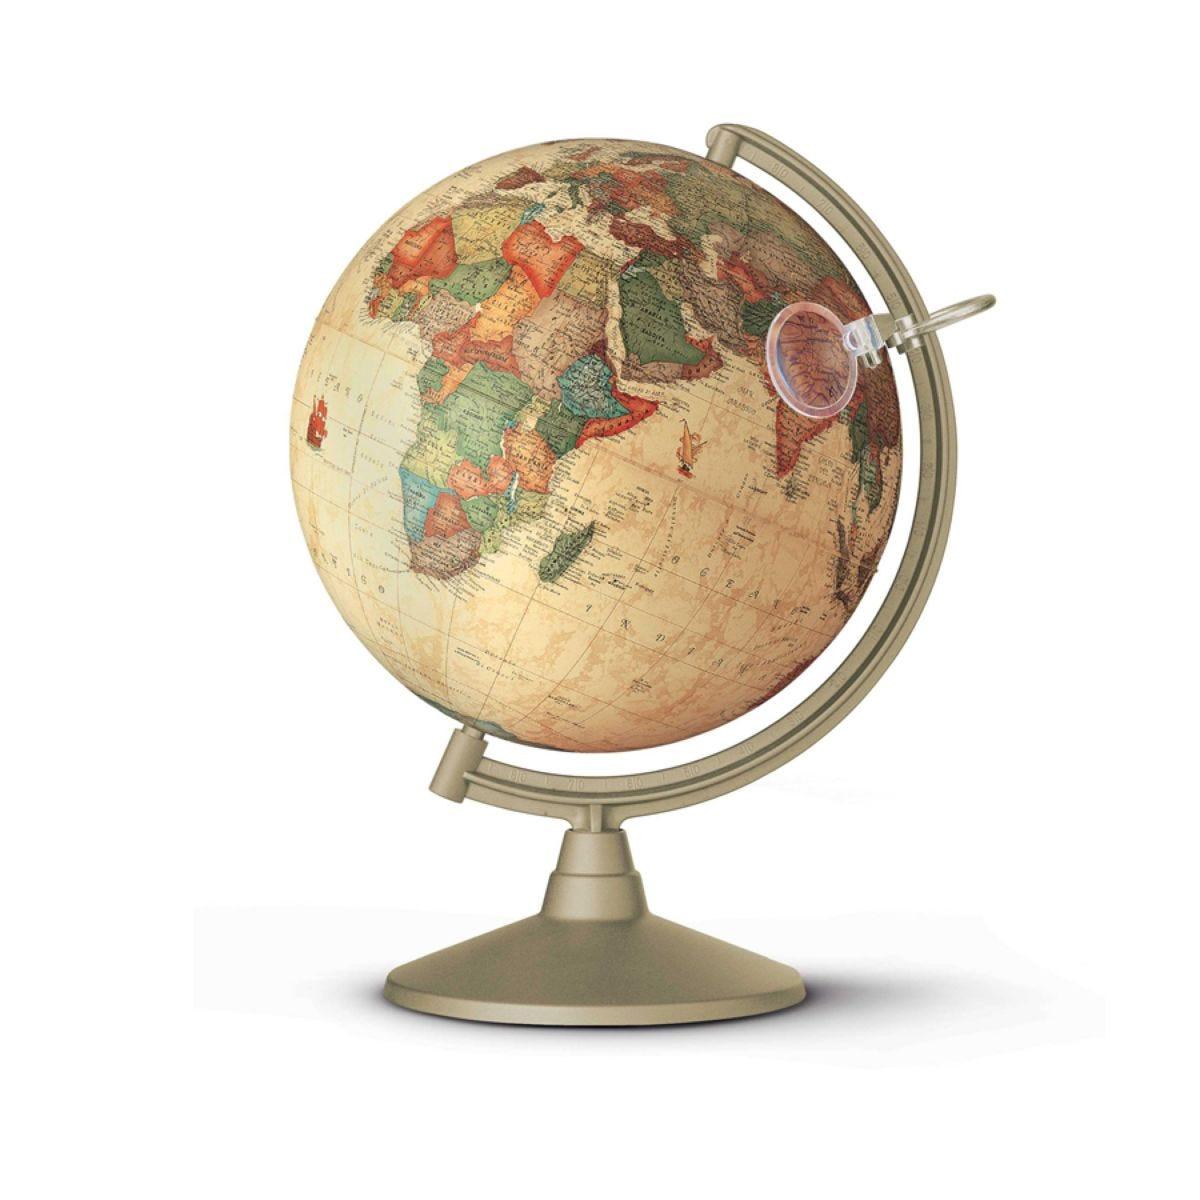 Nova Rico 30cm Illuminated Globe - Marco Polo